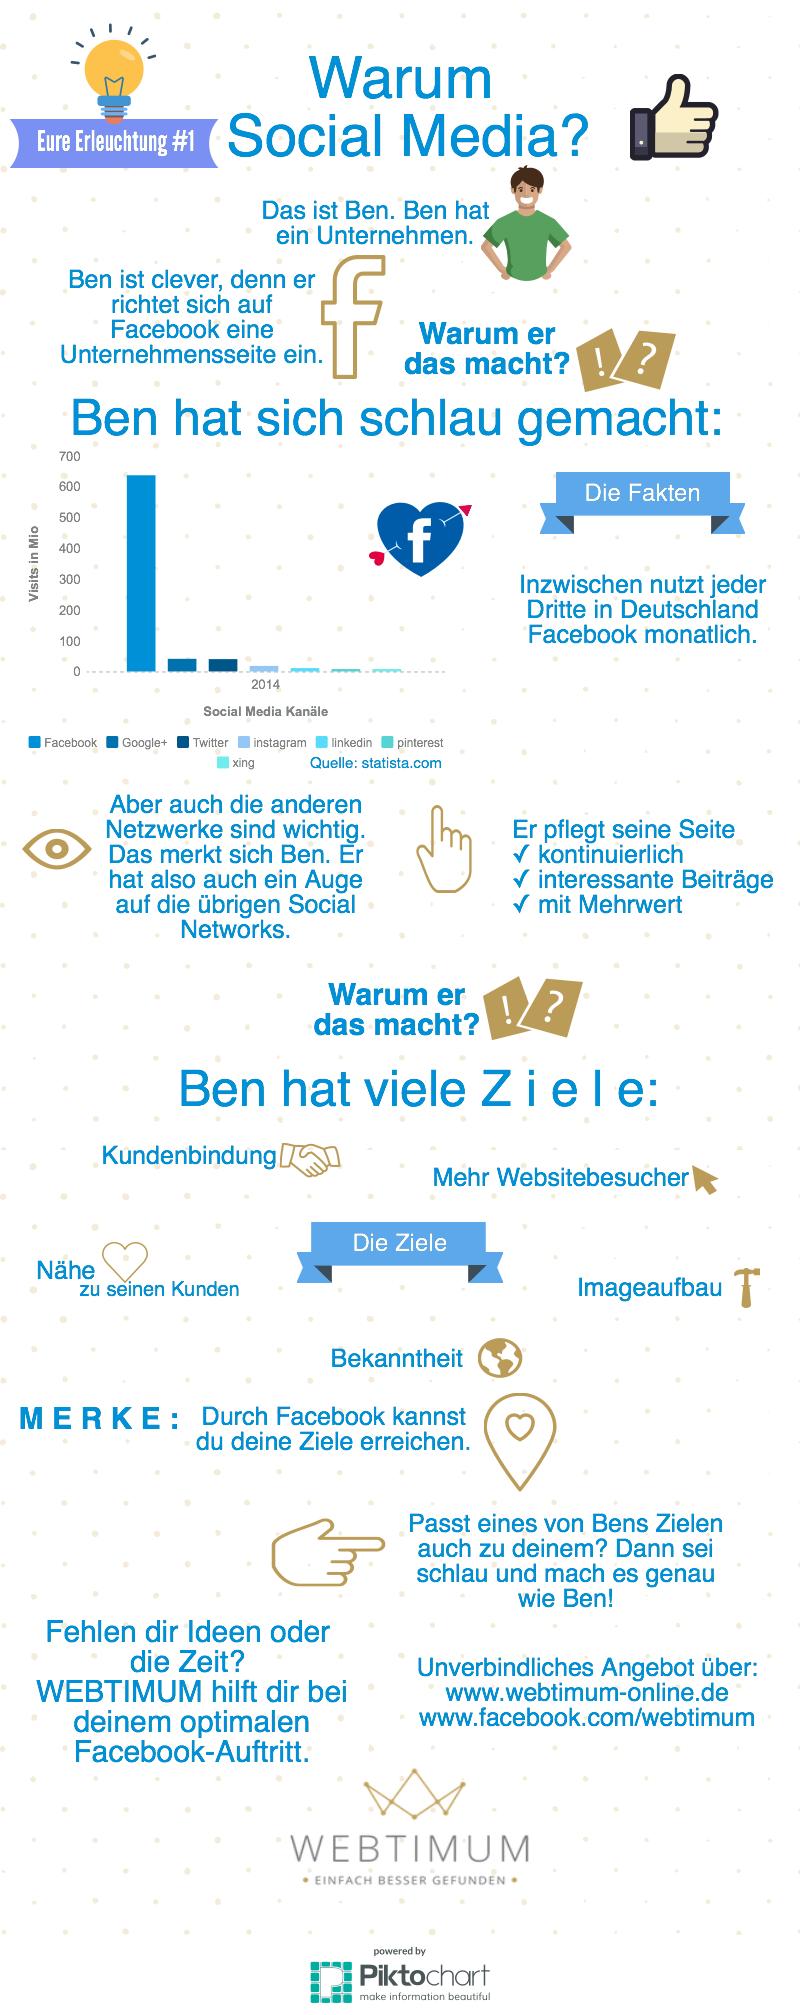 Warum Social Media? Infografik